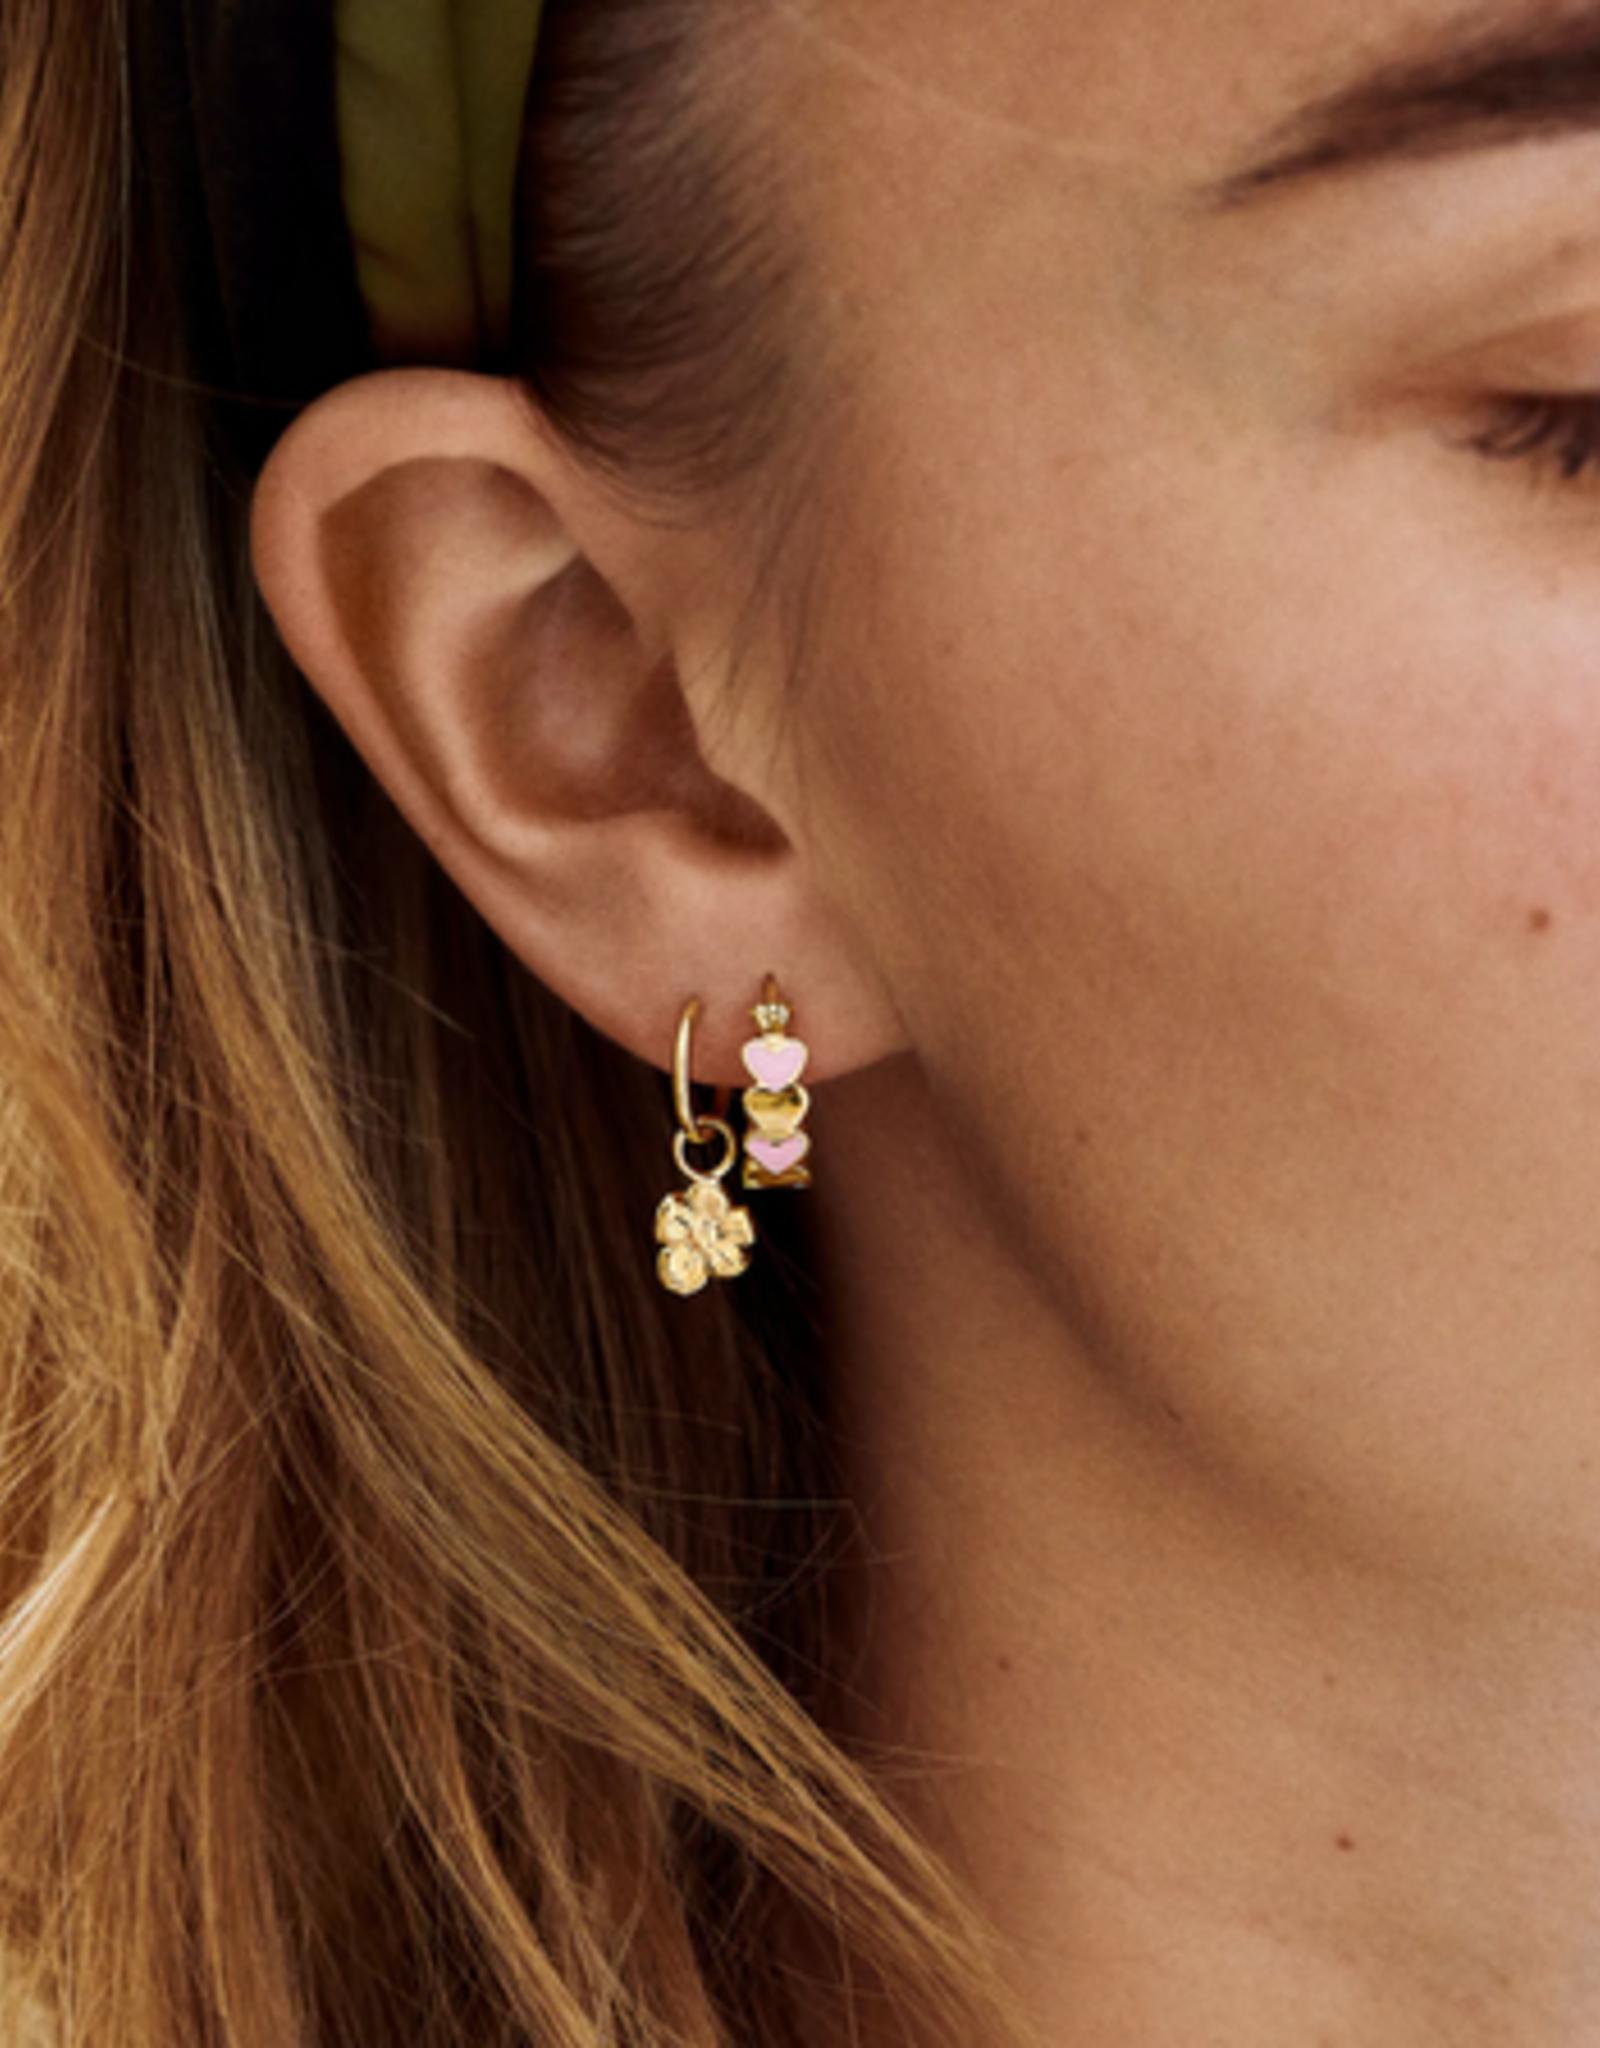 Anna + Nina Single soul flower ring earring goldplated silver